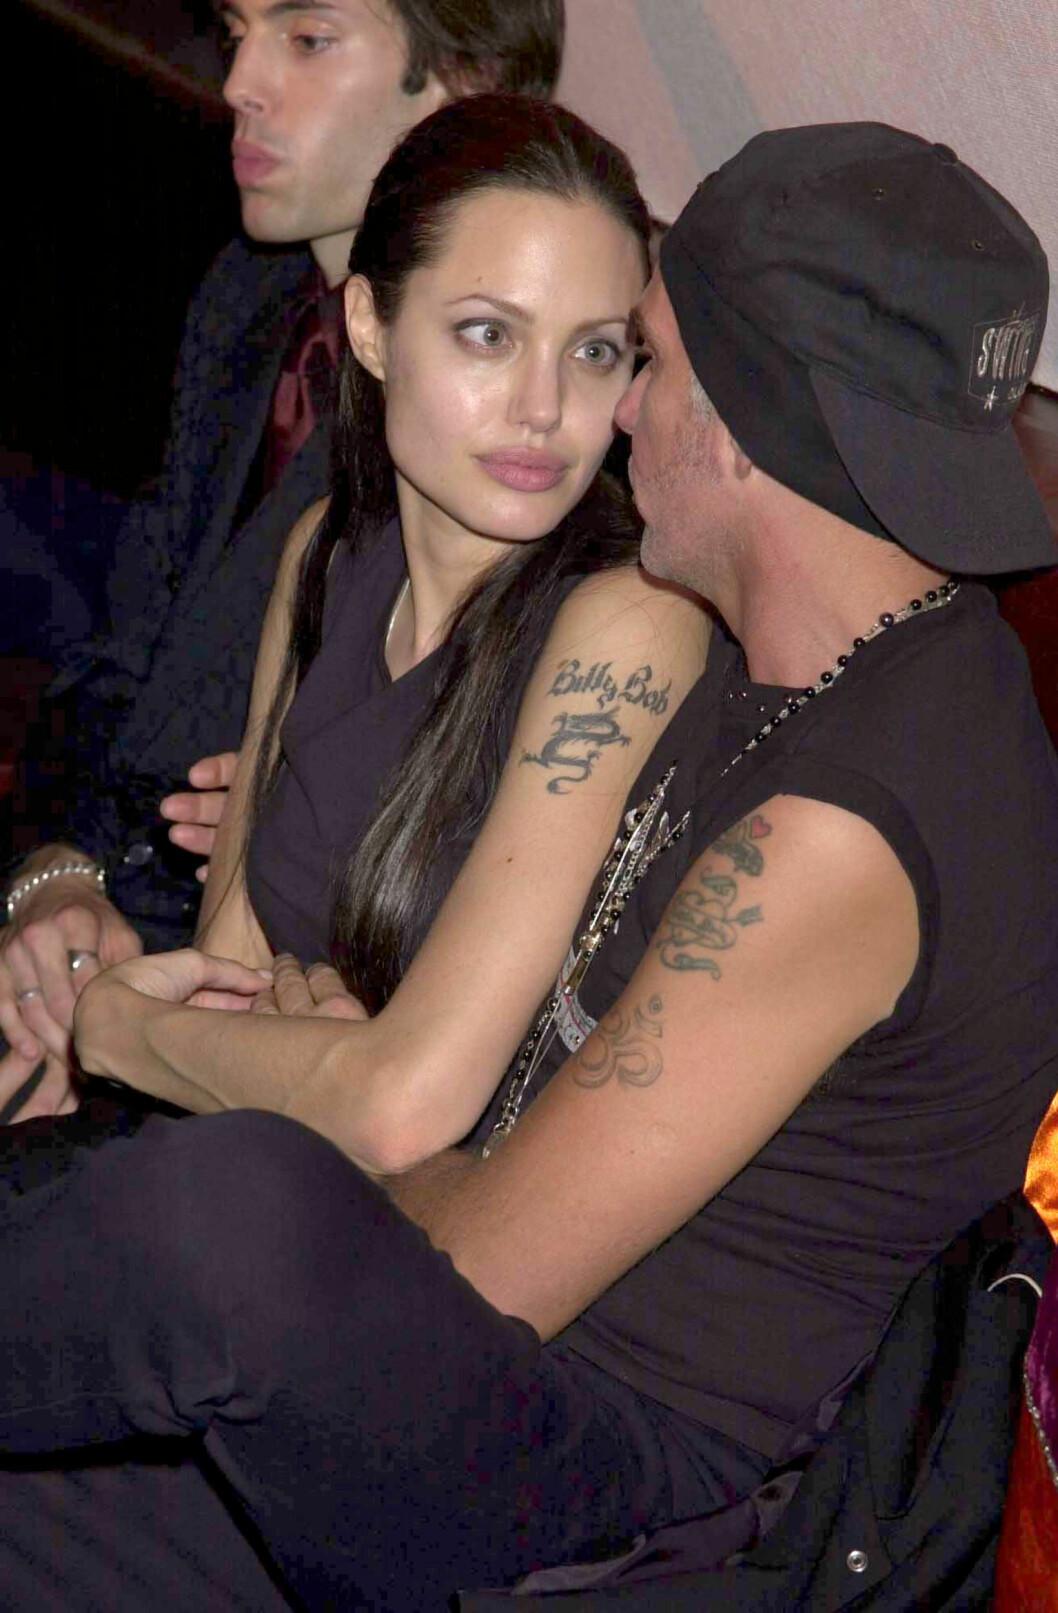 <strong>FJERNET NAVNET:</strong> Angelina Jolie har fjernet navnet til sin andre ektemann Billy Bob Thornton. De var gift fra 2000 til 2003.  Foto: REX/Richard Young/All Over Press